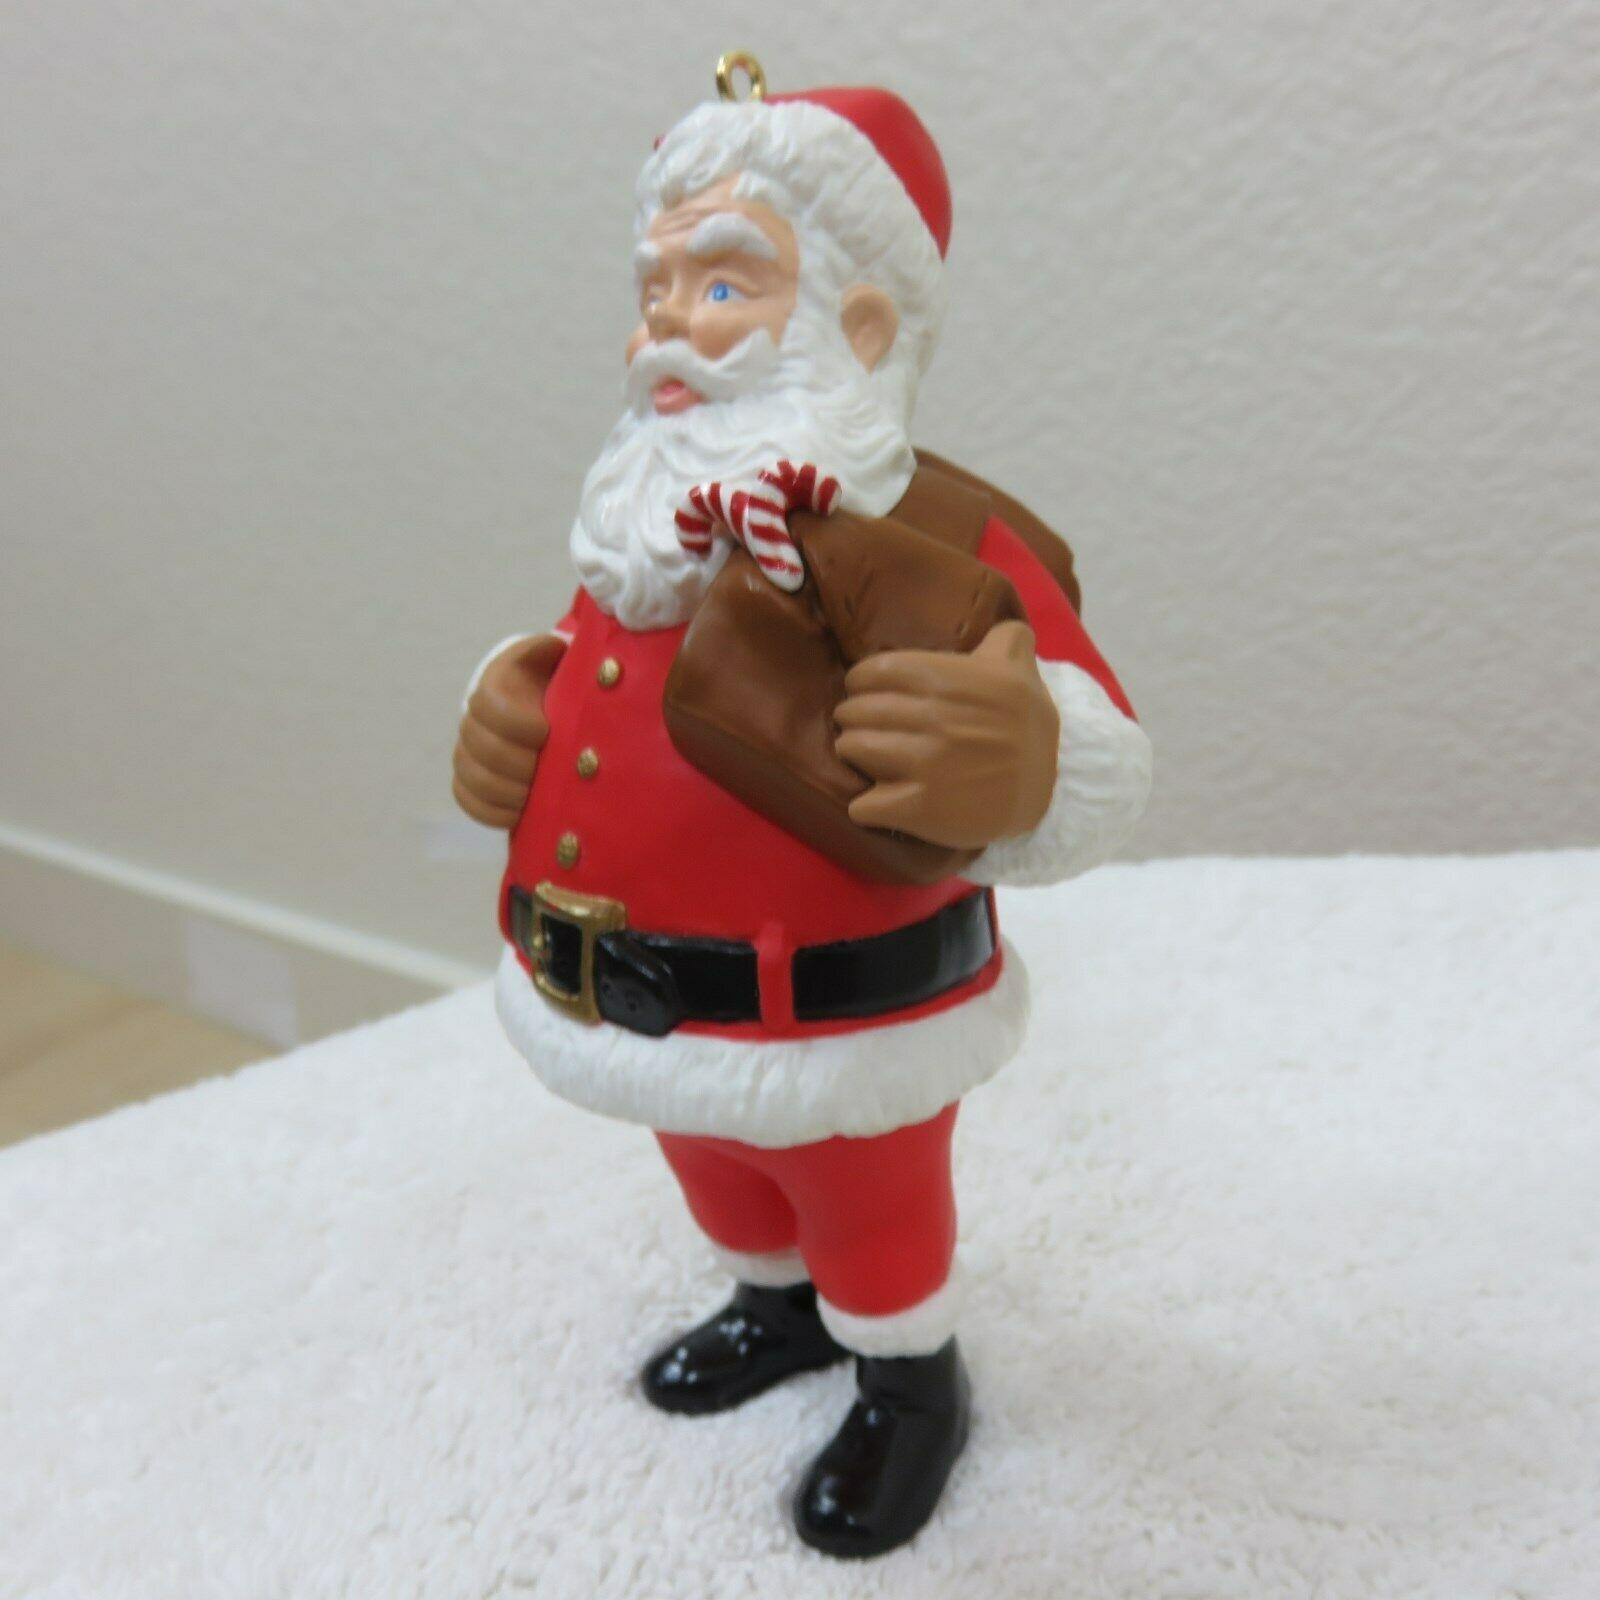 Vintage 1996 Hallmark Keepsake Ornament Santa in Original Box image 5